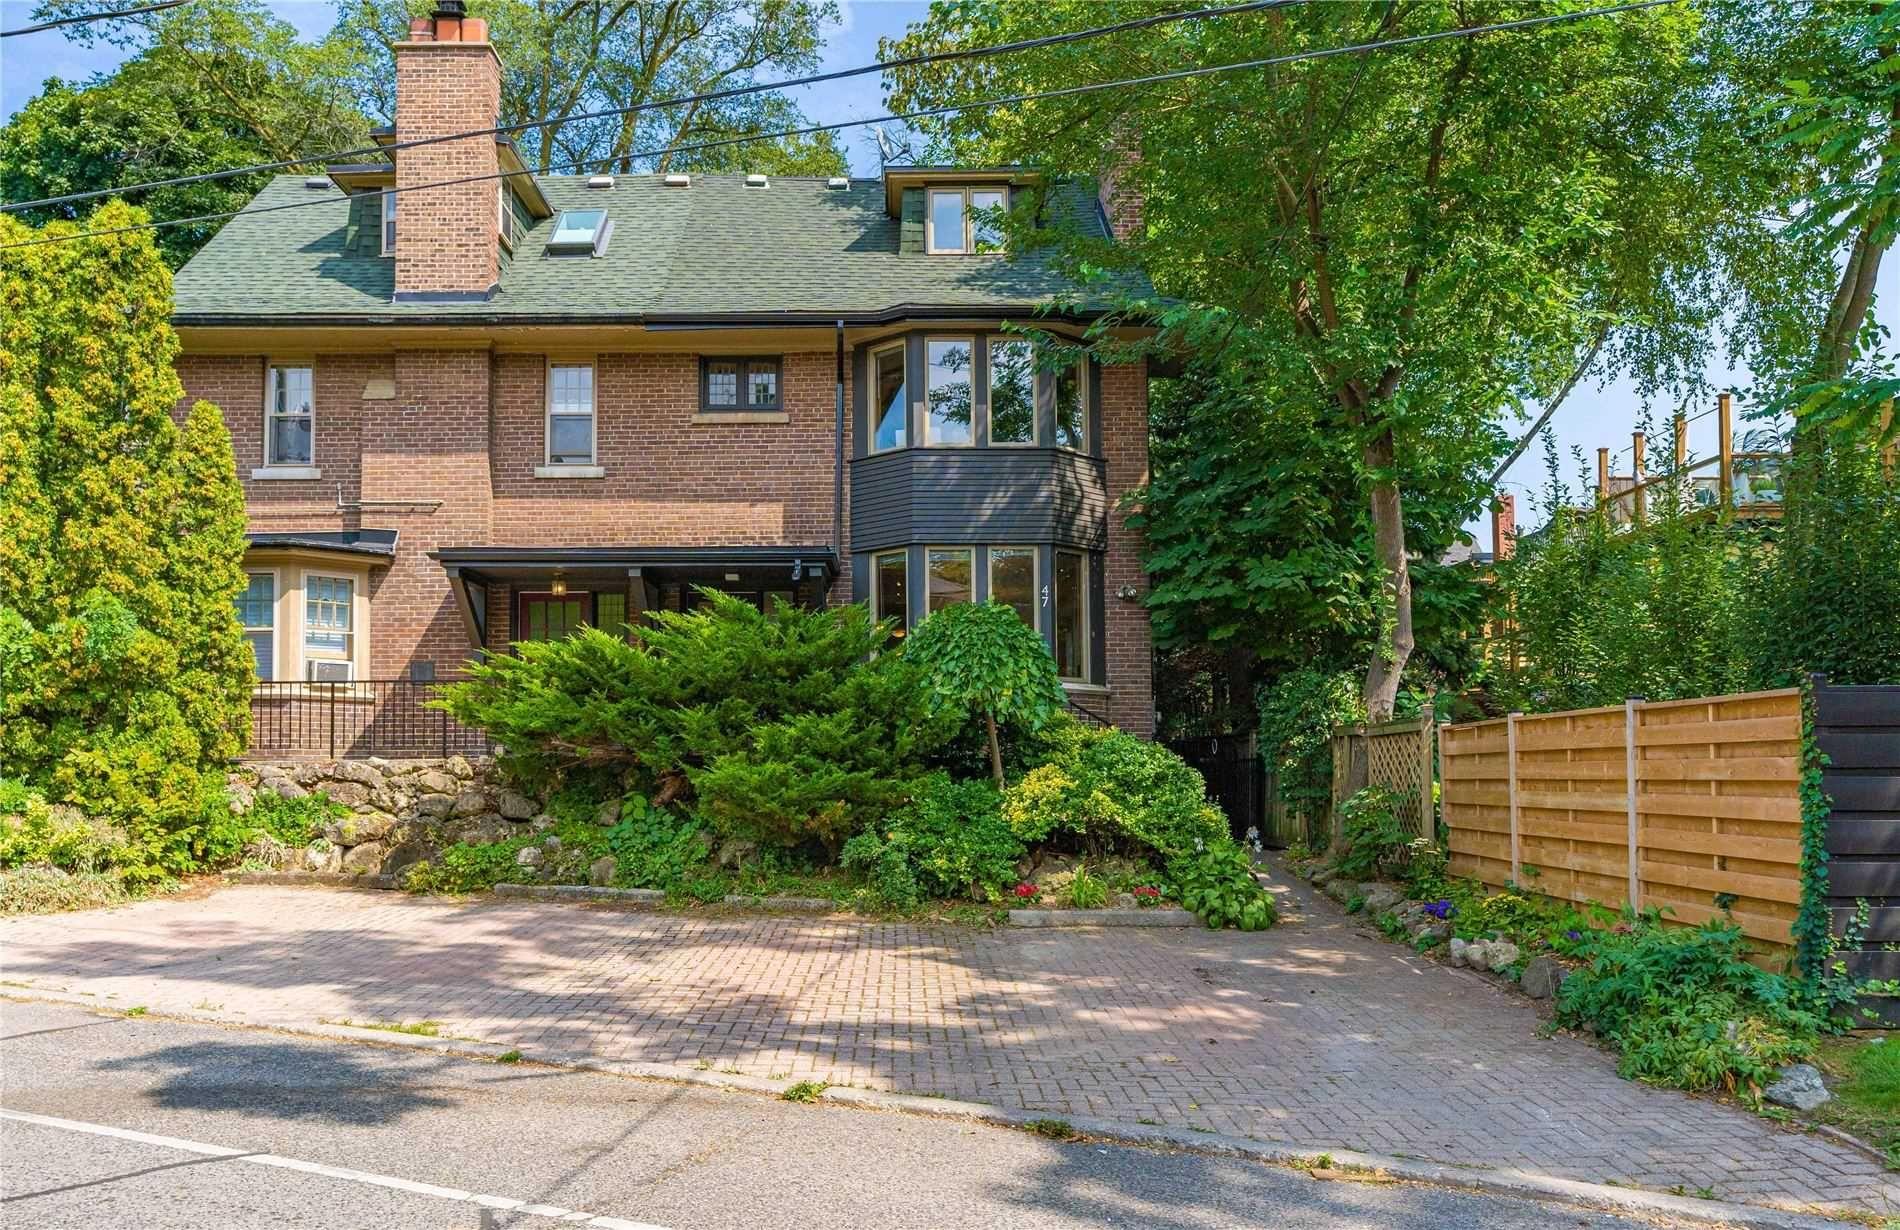 Main Photo: 47 Poplar Plains Road in Toronto: Casa Loma House (2 1/2 Storey) for sale (Toronto C02)  : MLS®# C5376433